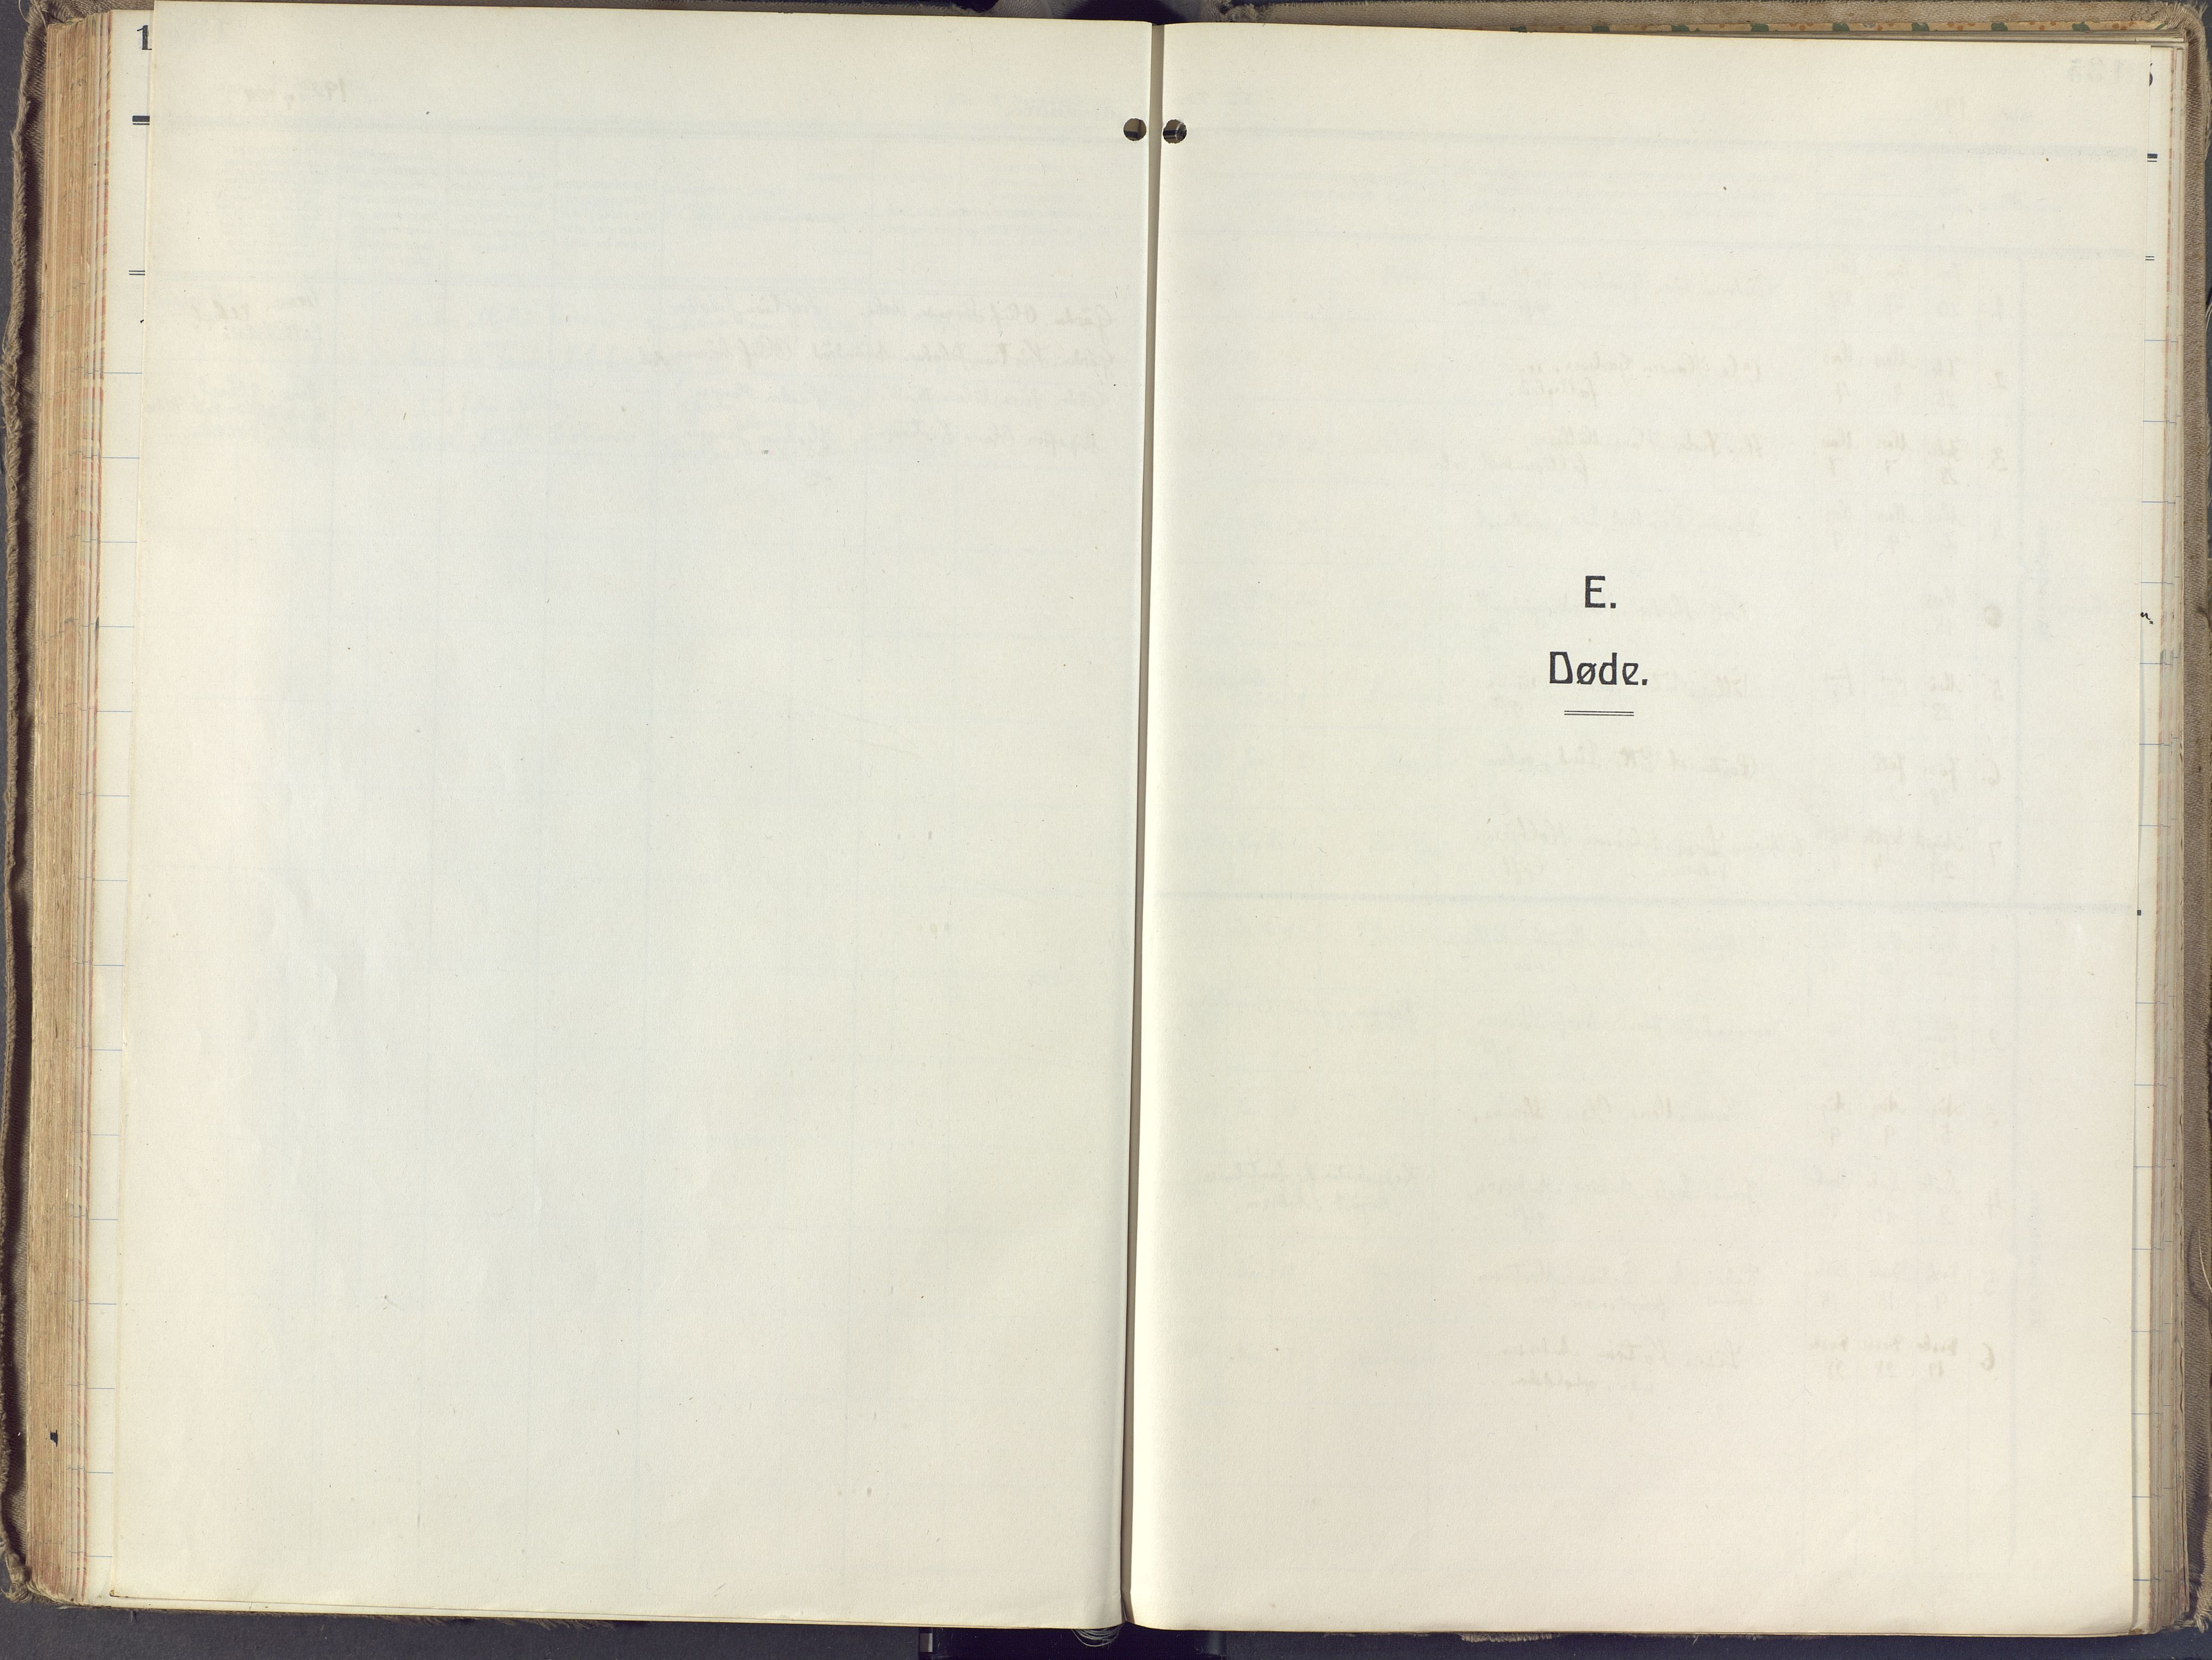 SAKO, Brunlanes kirkebøker, F/Fb/L0004: Ministerialbok nr. II 4, 1923-1940